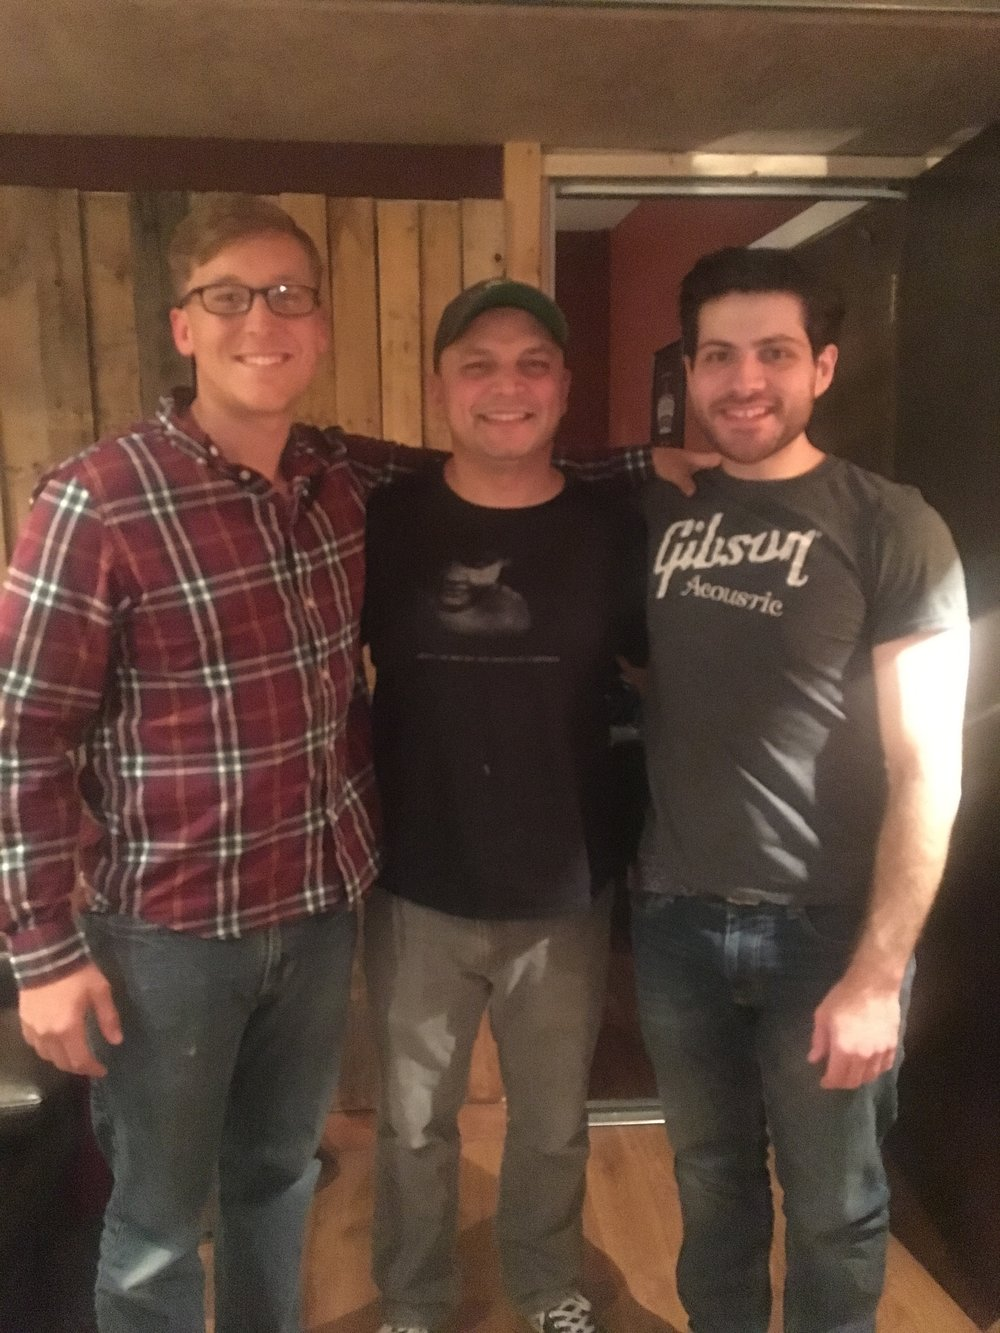 SGT Damian Knight, Producer Jerry Ramos and HSFV Ambassador/Guitar Player Cory Singer